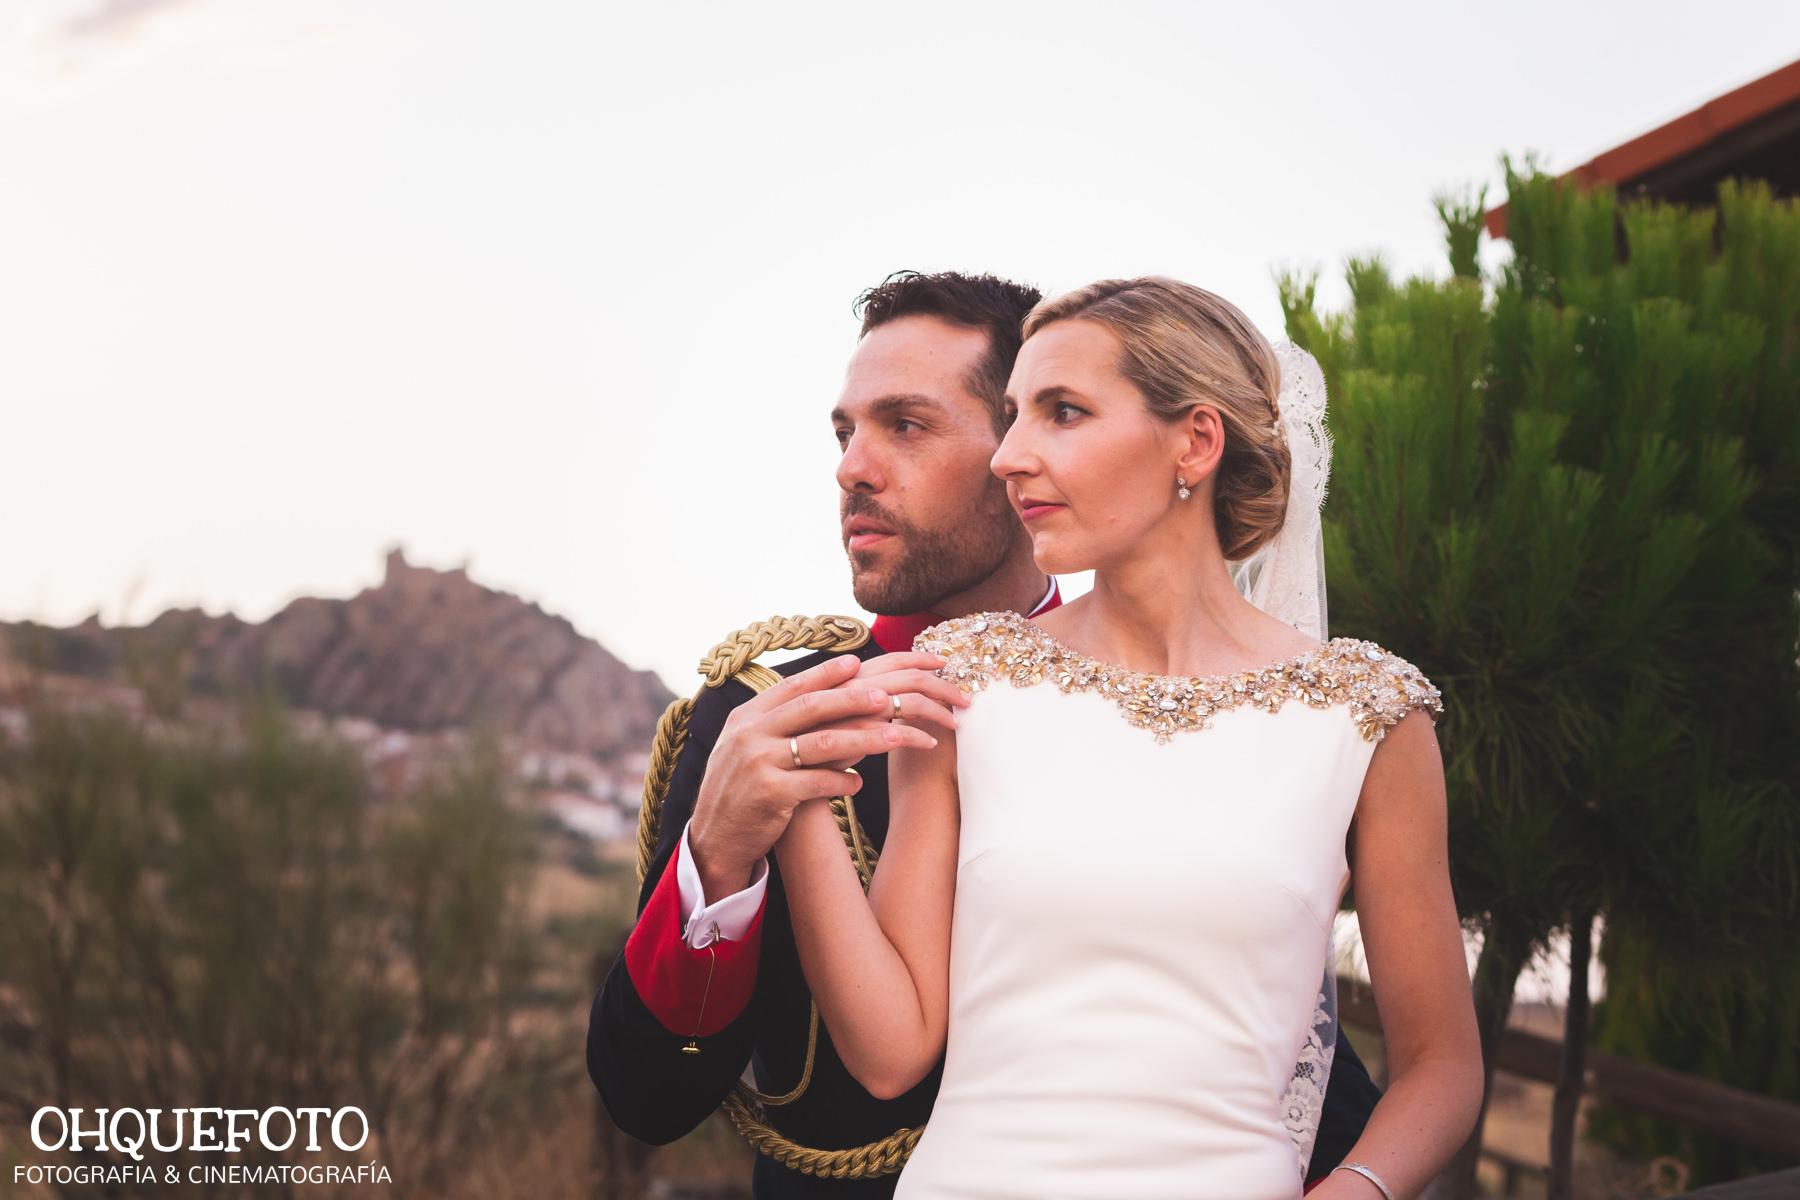 reportaje de boda en capilla-boda en finca la peraleda- boda en almaden- boda en chillon - reportaje de boda en ordoba